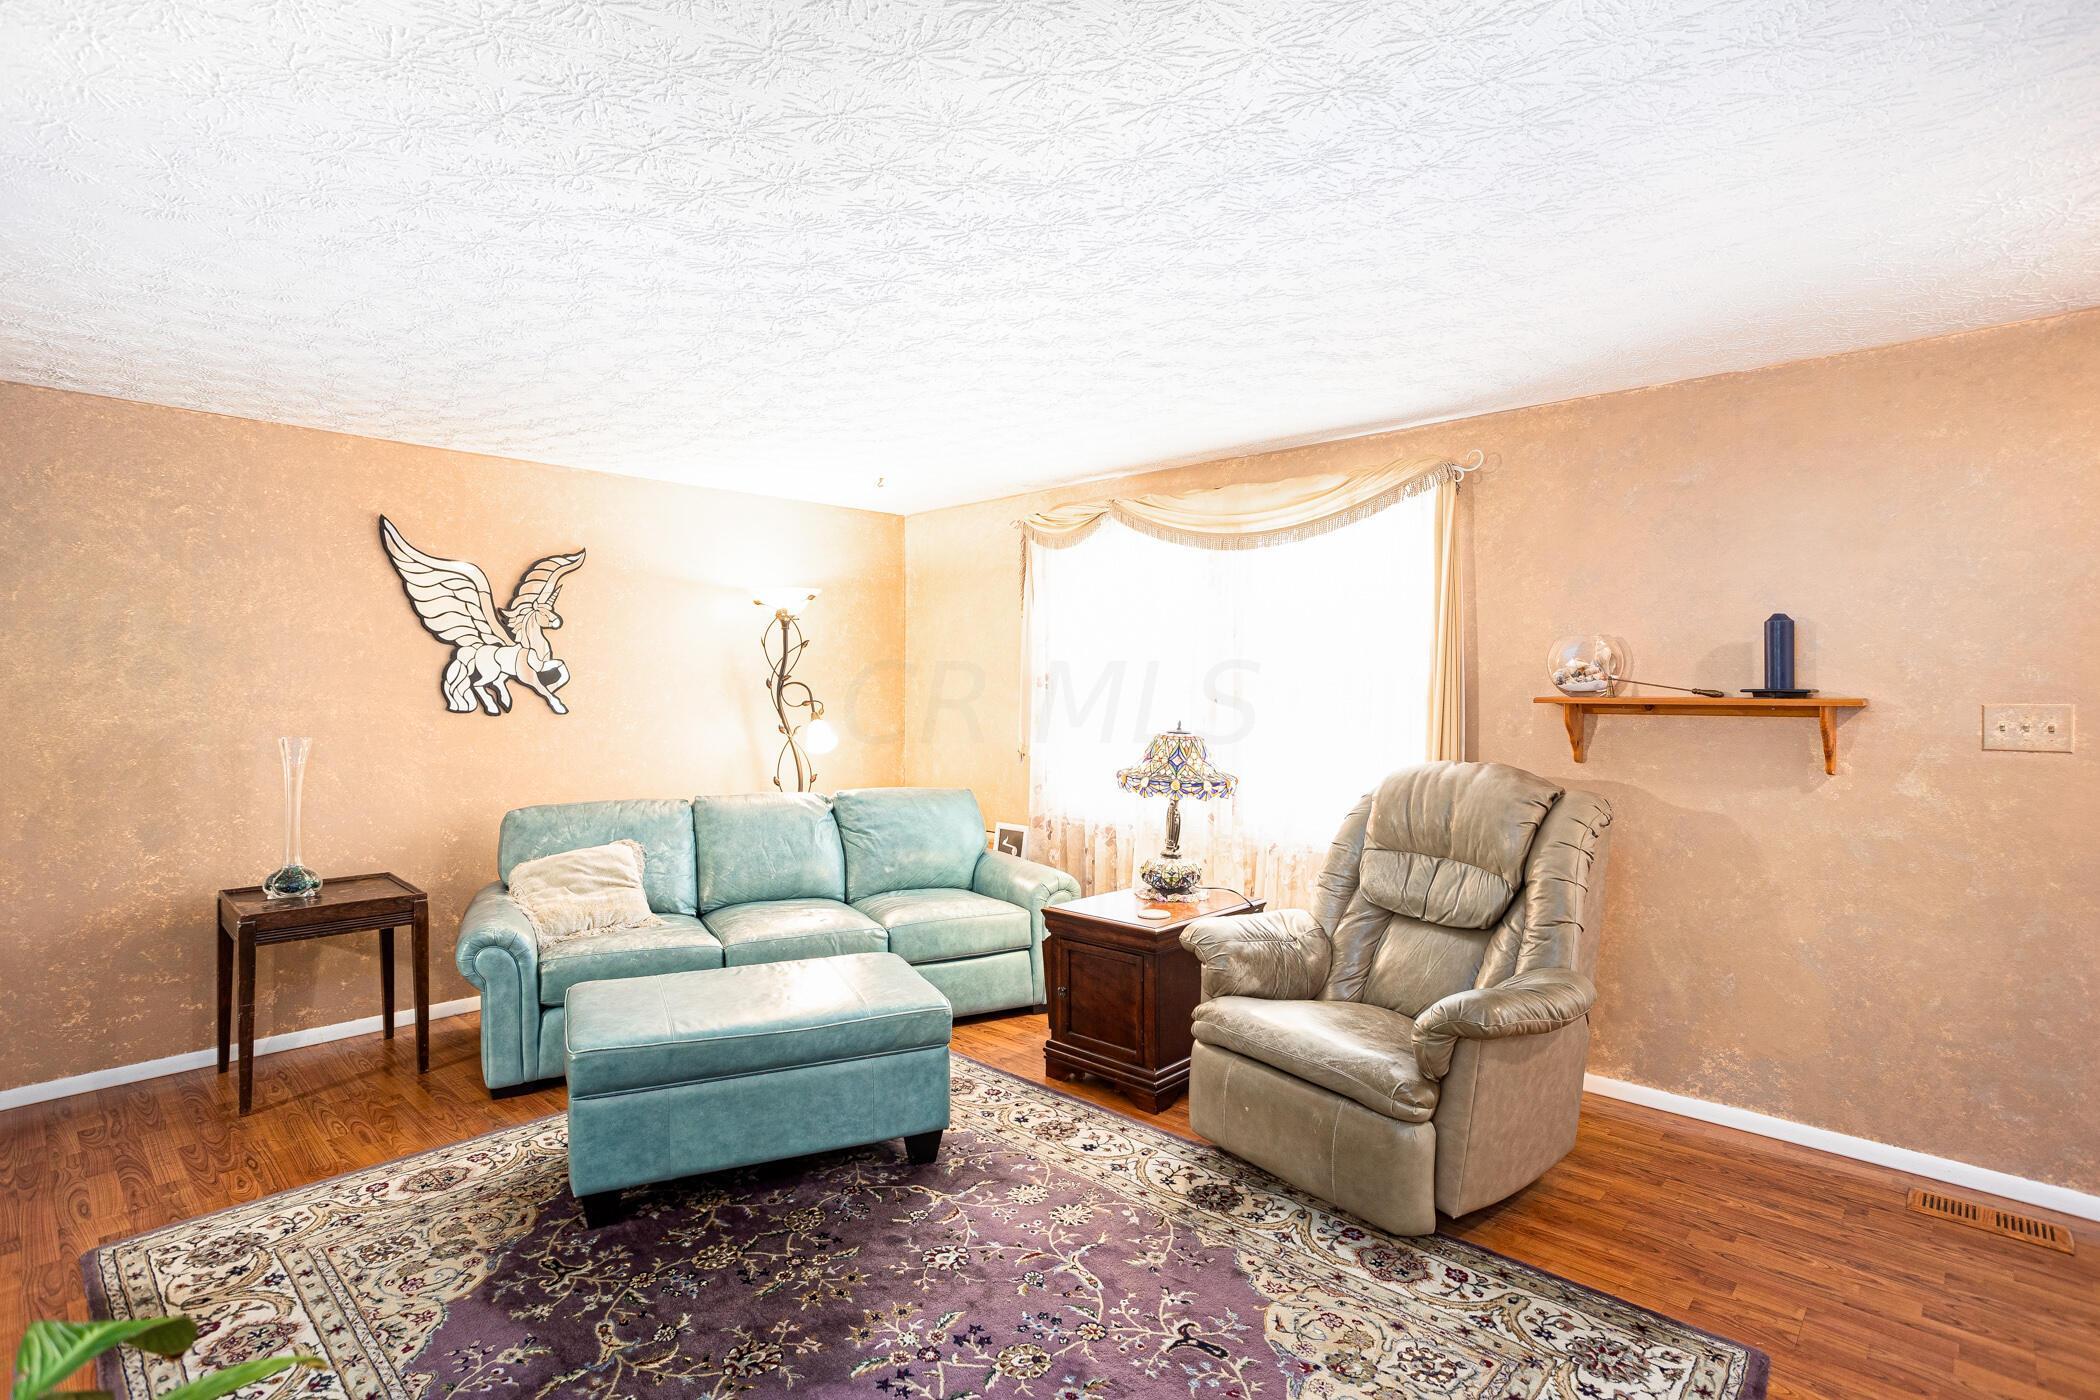 1301 Hathersage Place, Galloway Ohio 431